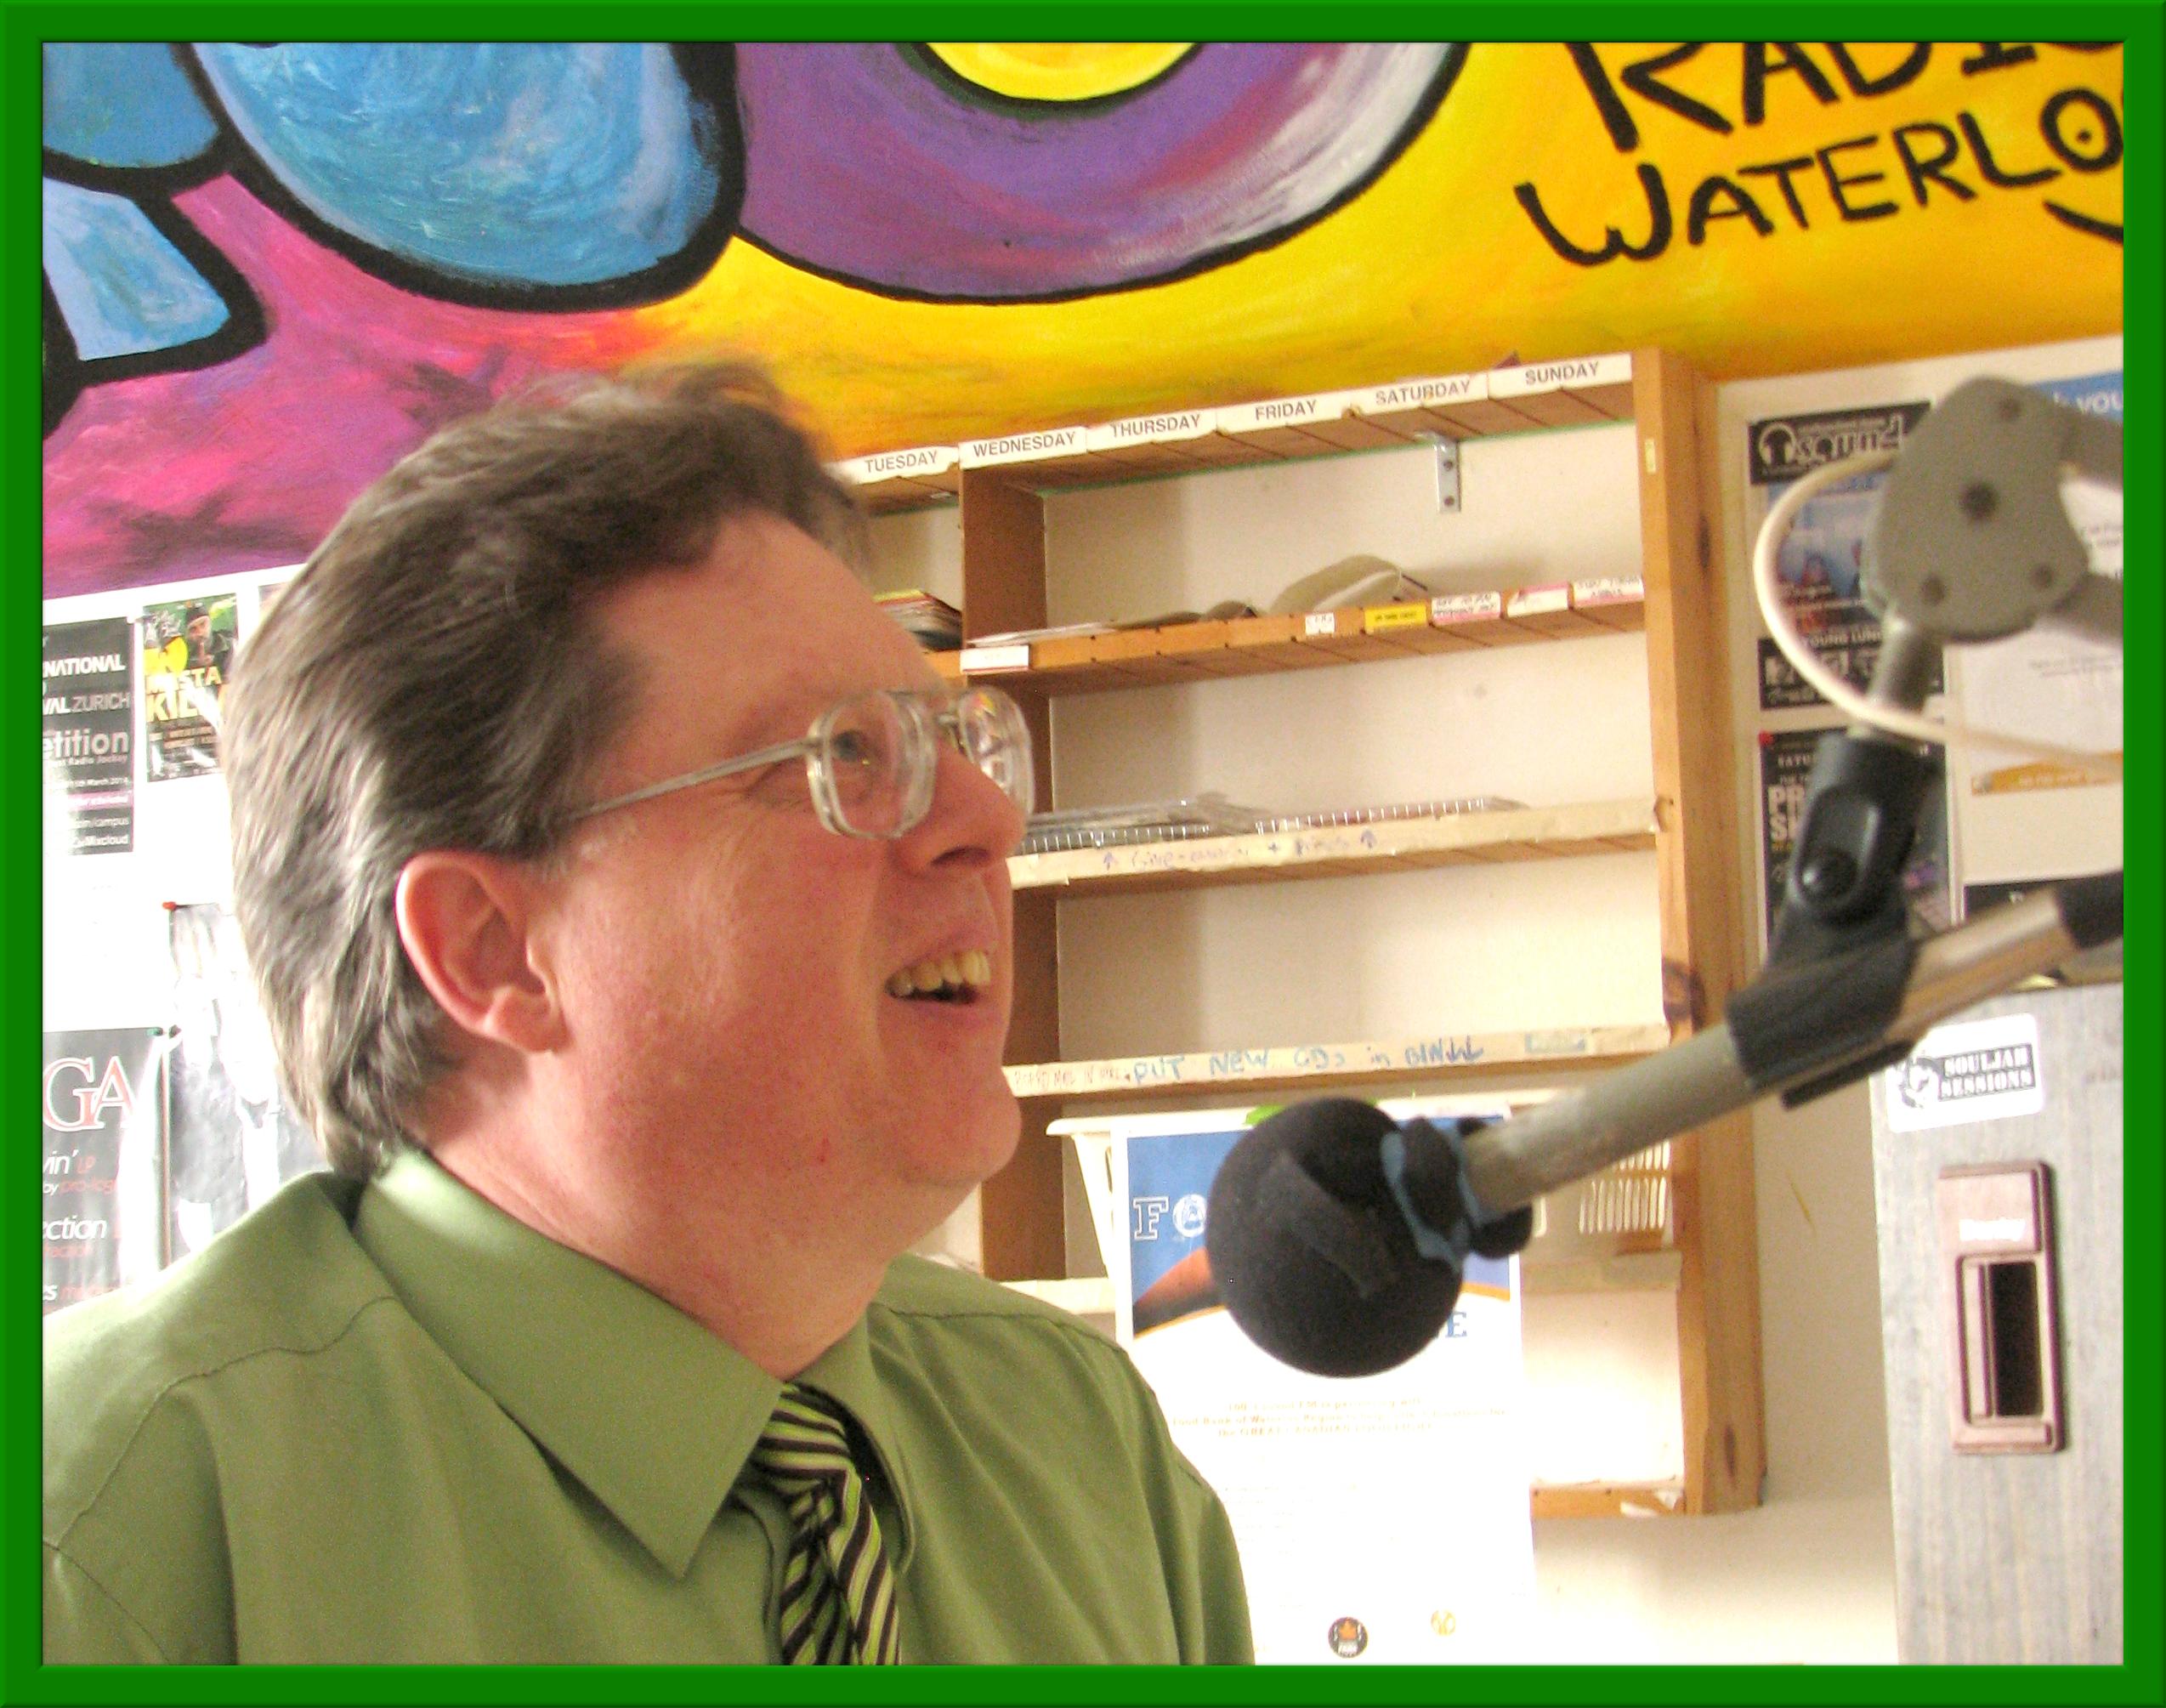 Bob Jonkman on air at Sound FM